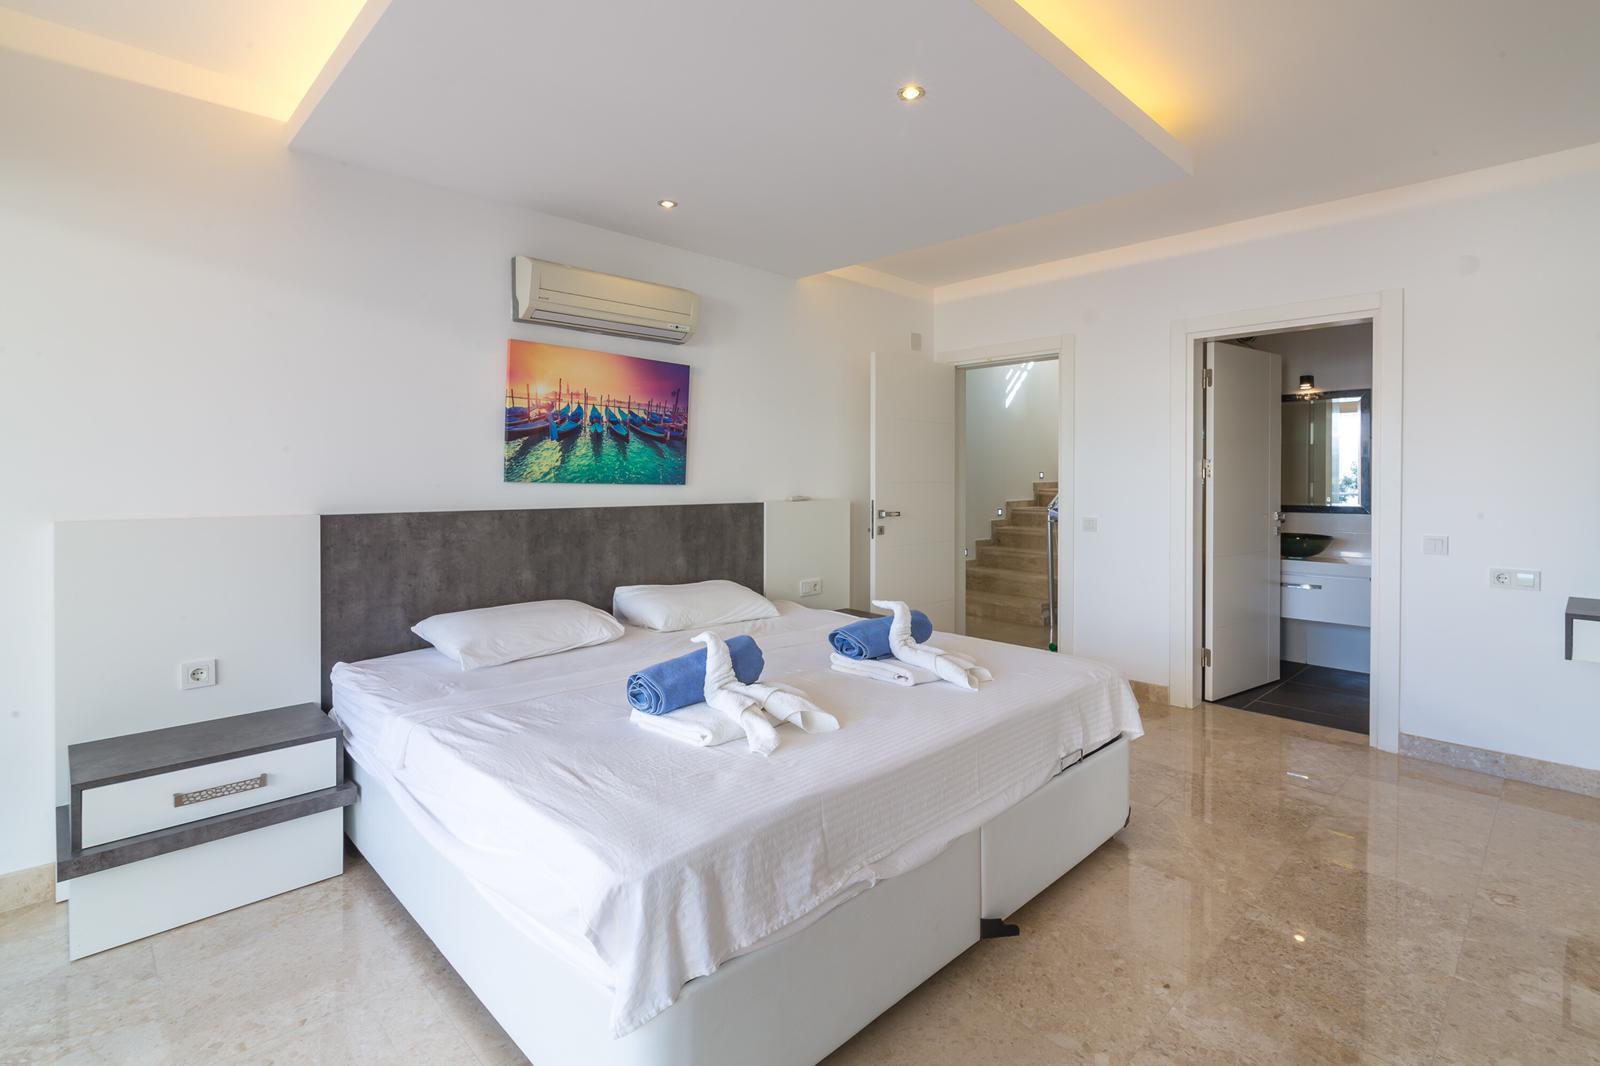 everest venice bedroom